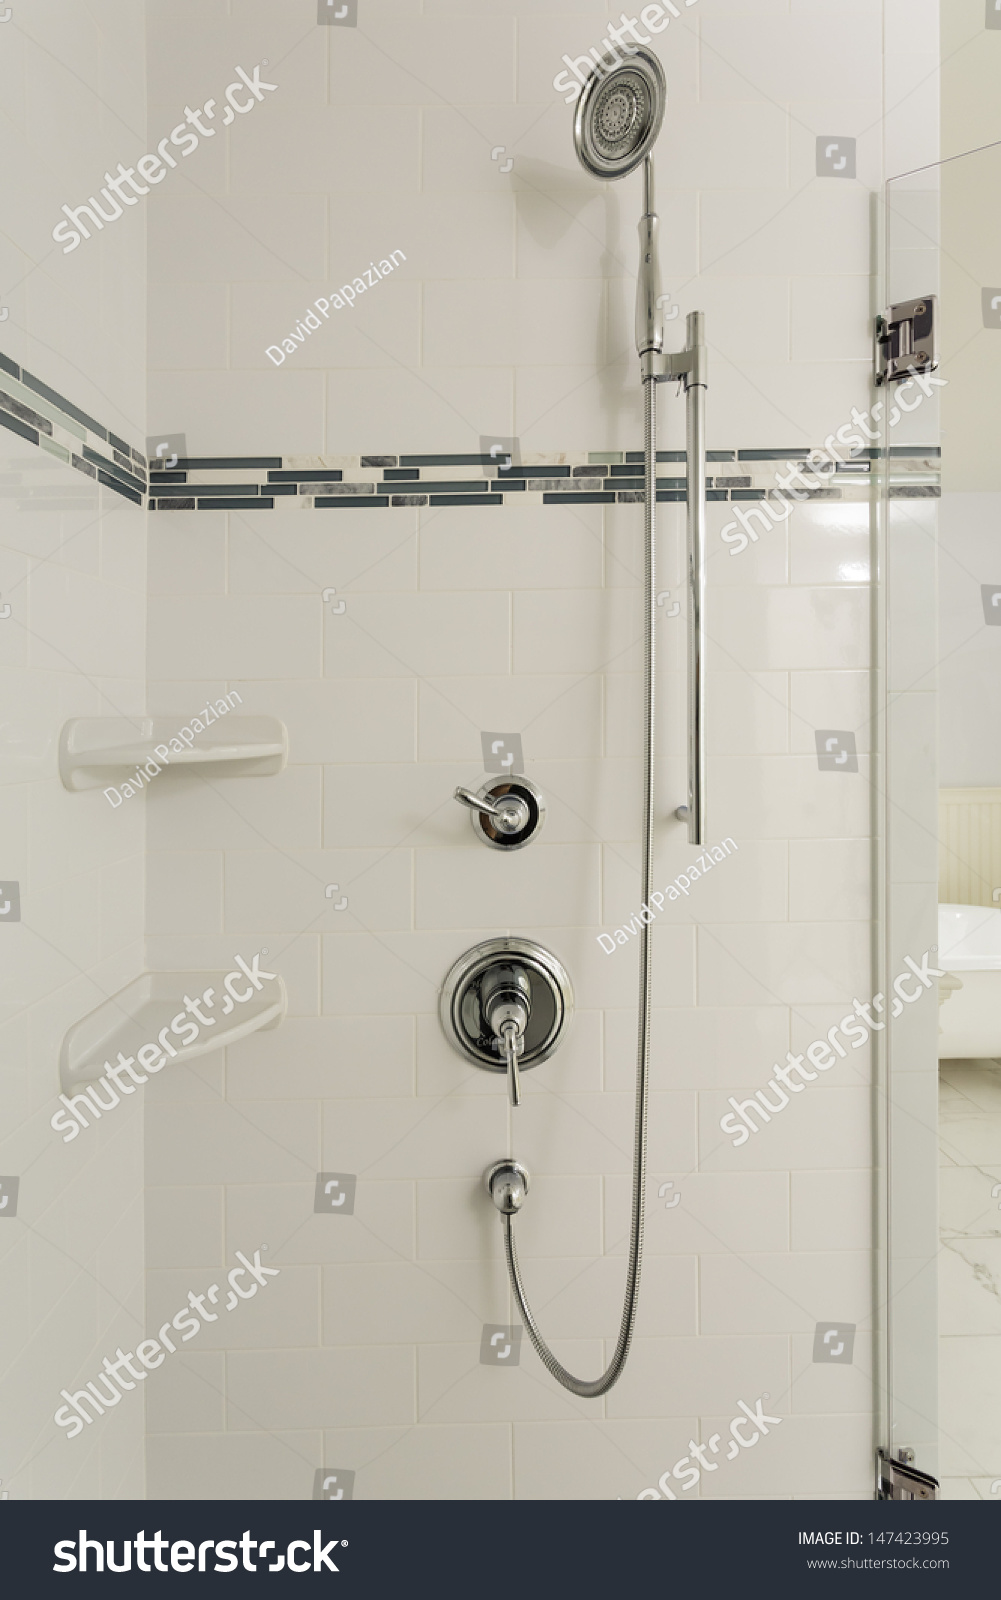 Luxury Large Walk In Showers.Large Shower Upscale Homevertical Shot Luxury Stock Photo